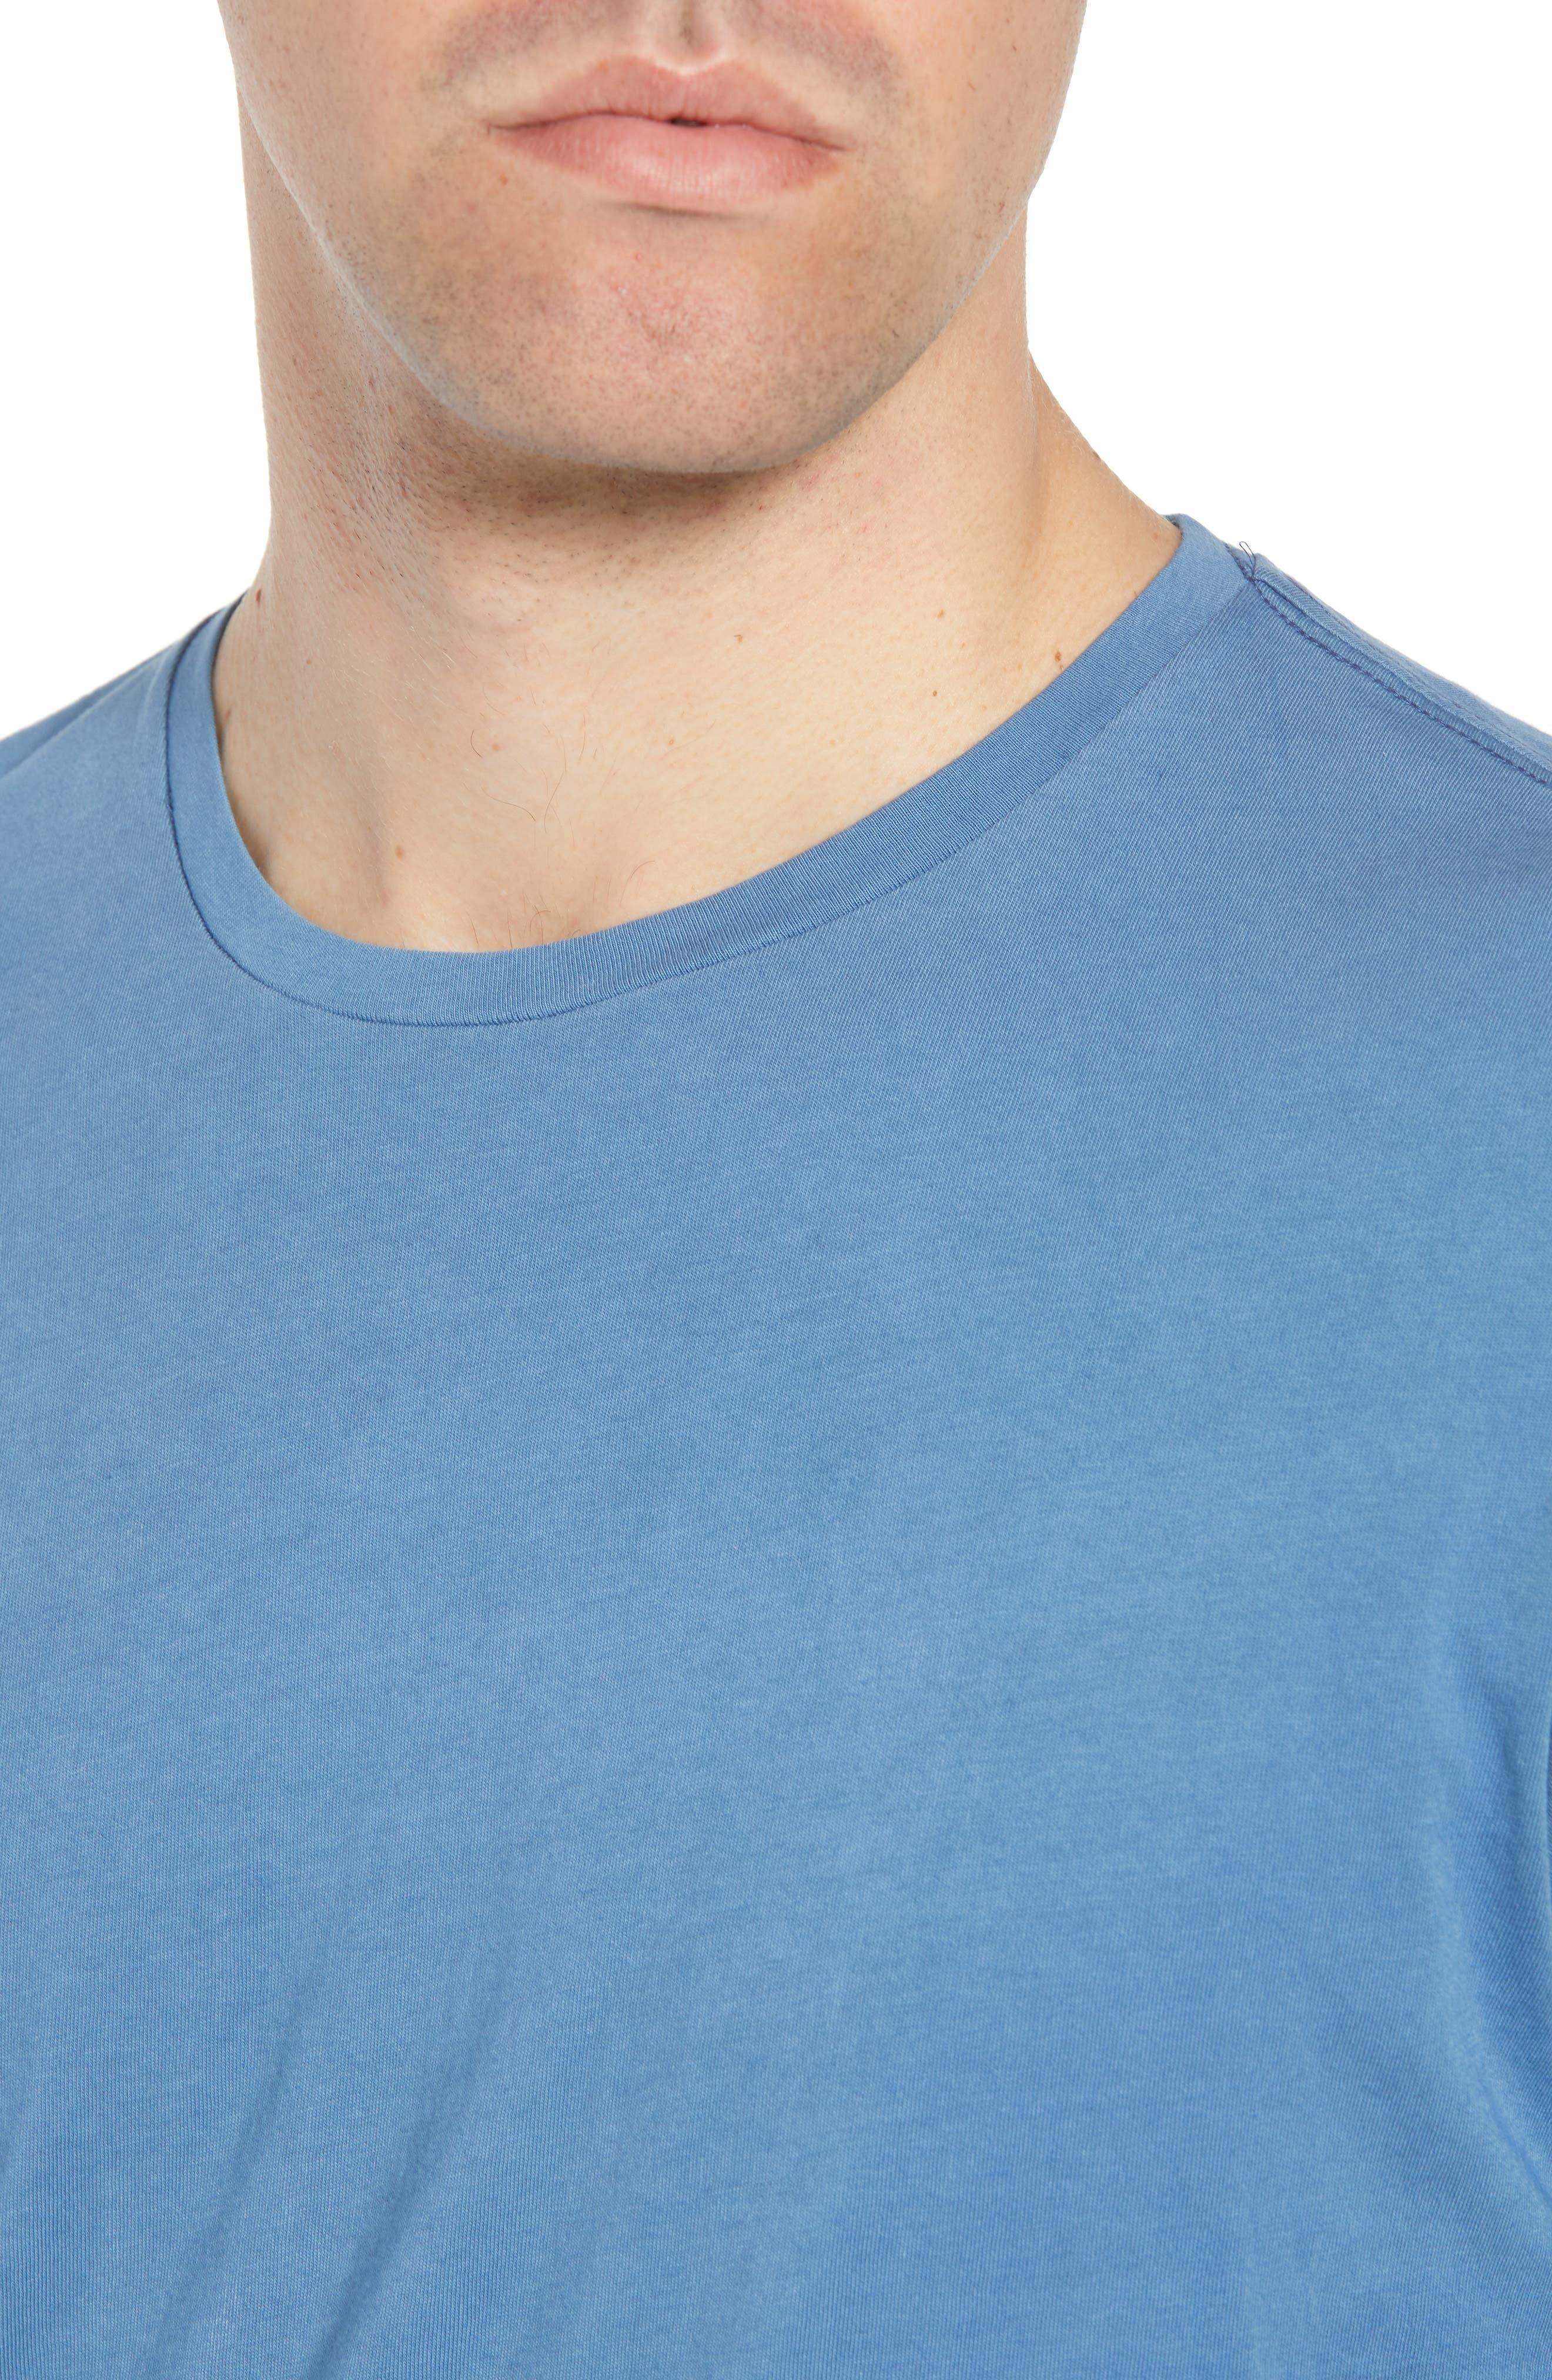 Dip Dye T-Shirt,                             Alternate thumbnail 4, color,                             Navy Ombre